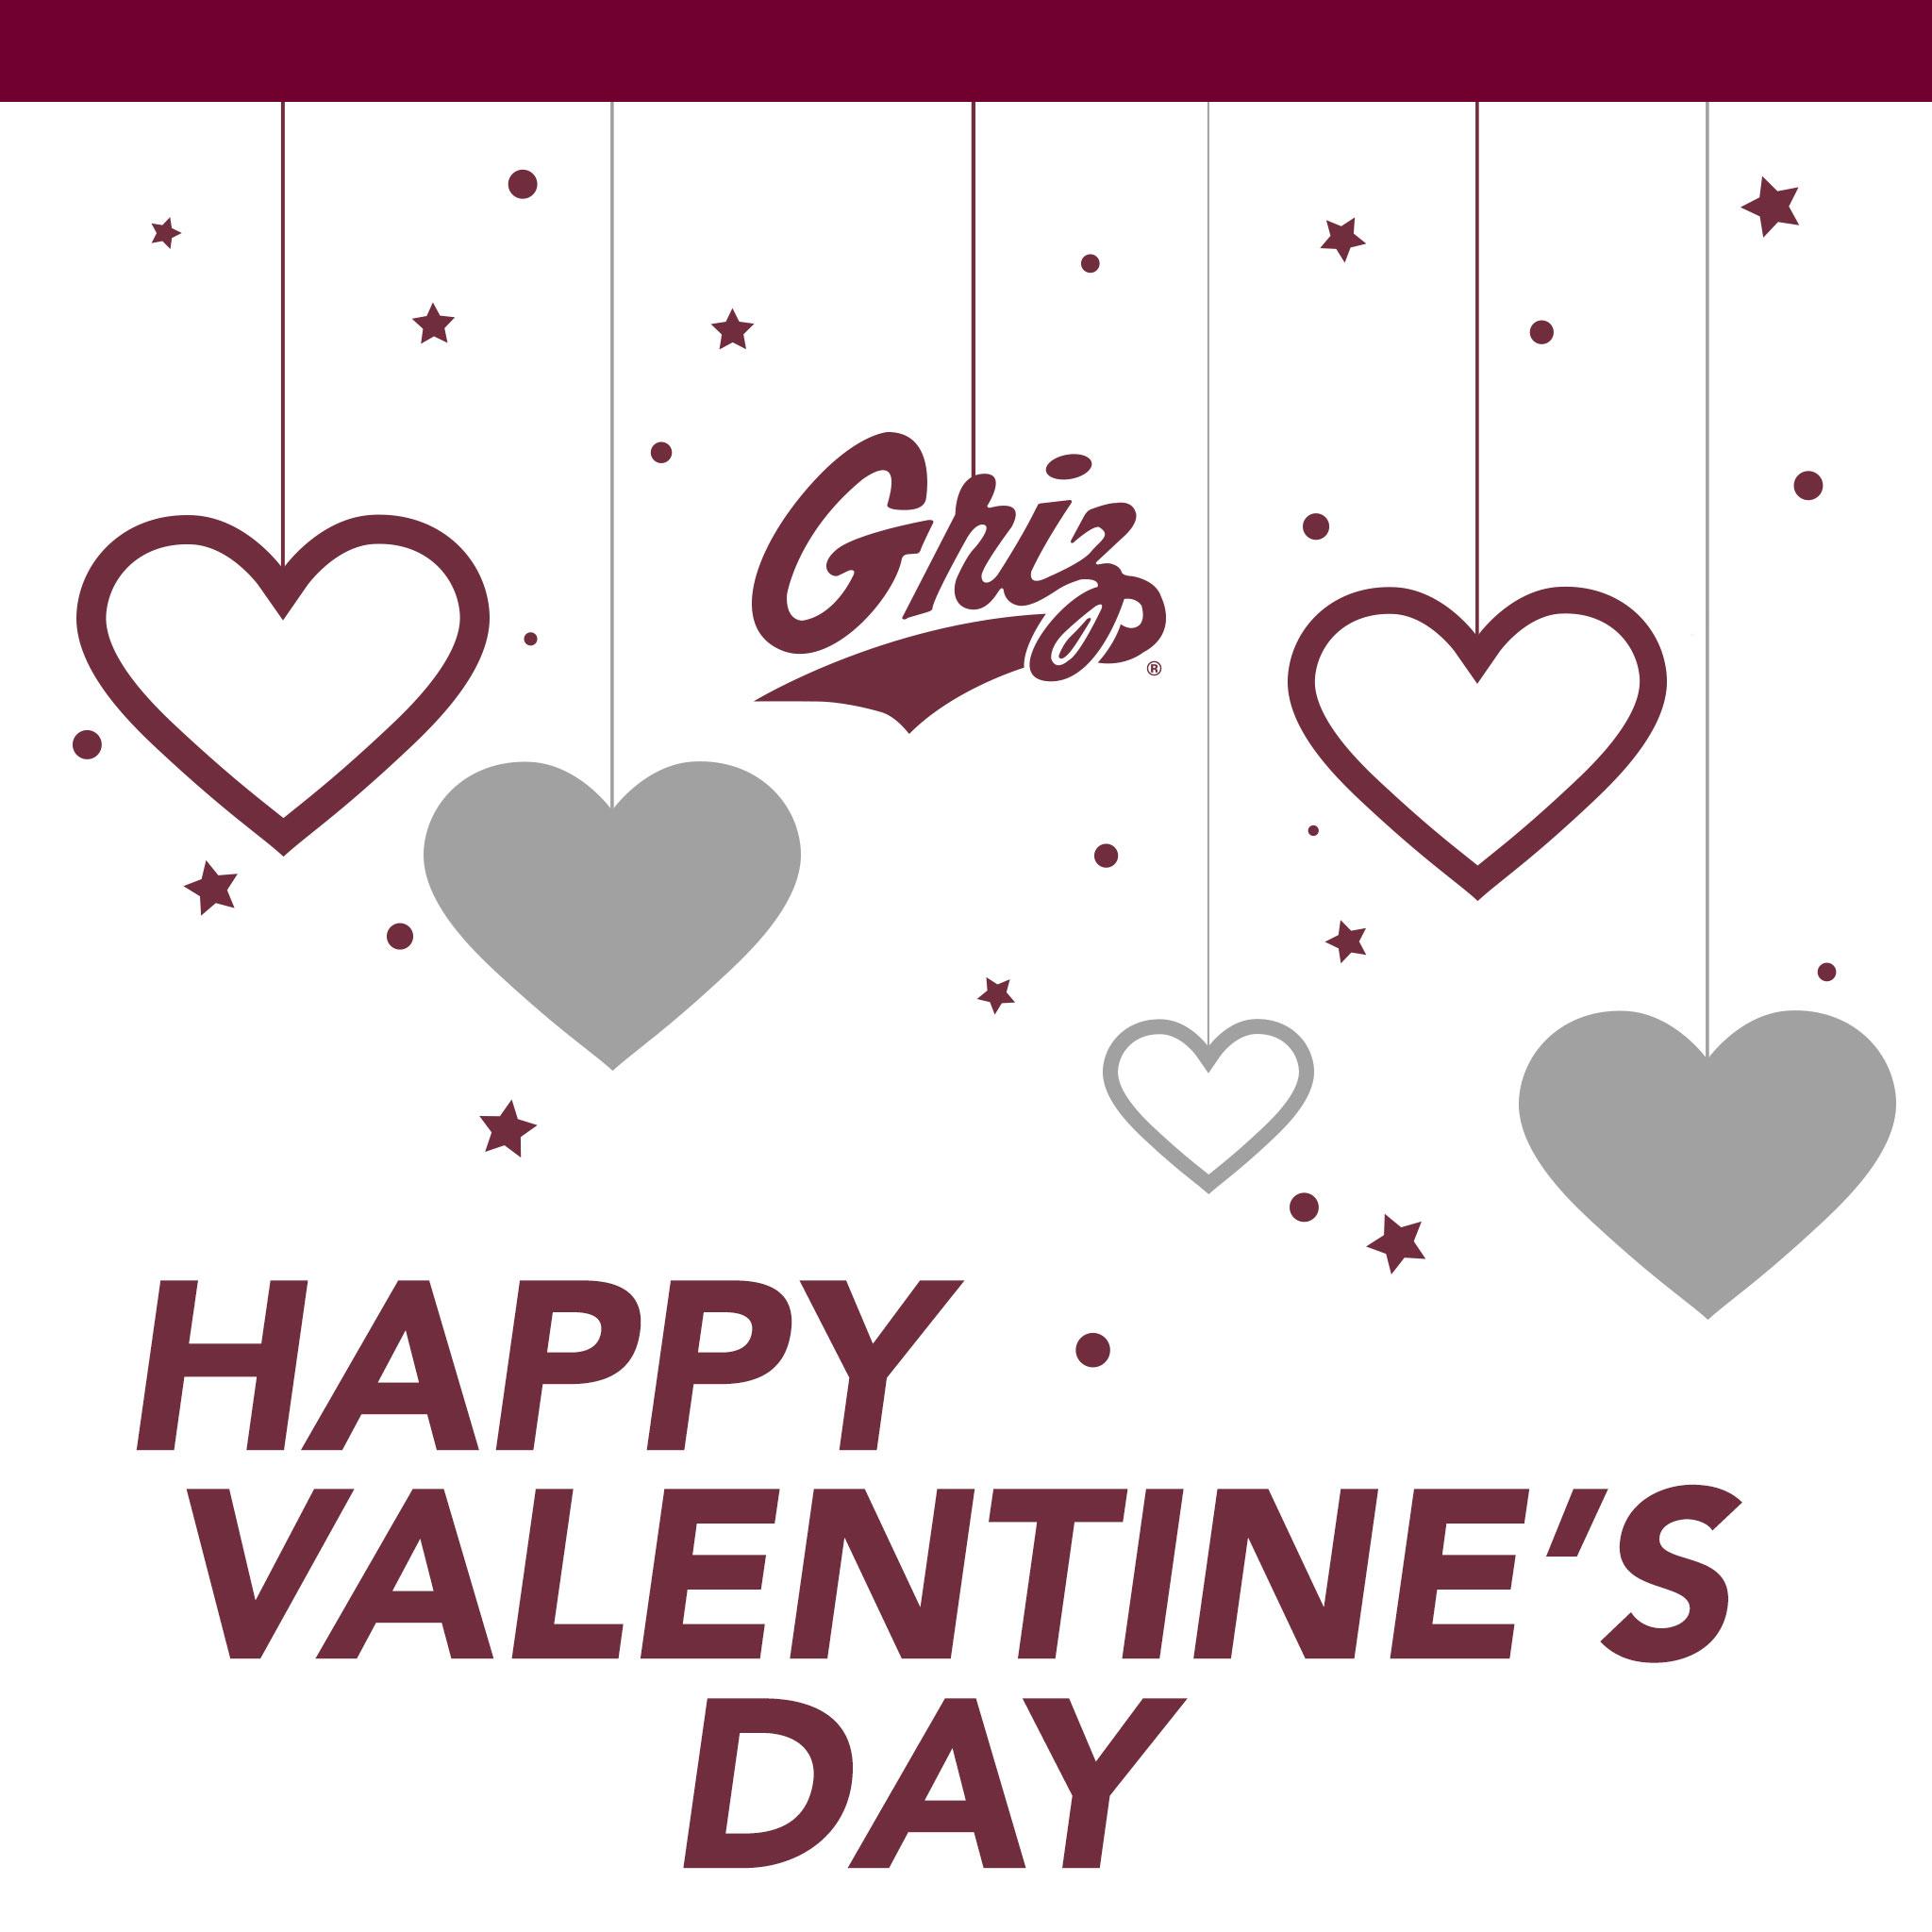 MONT.1901-SocialMedia_ValentinesDay